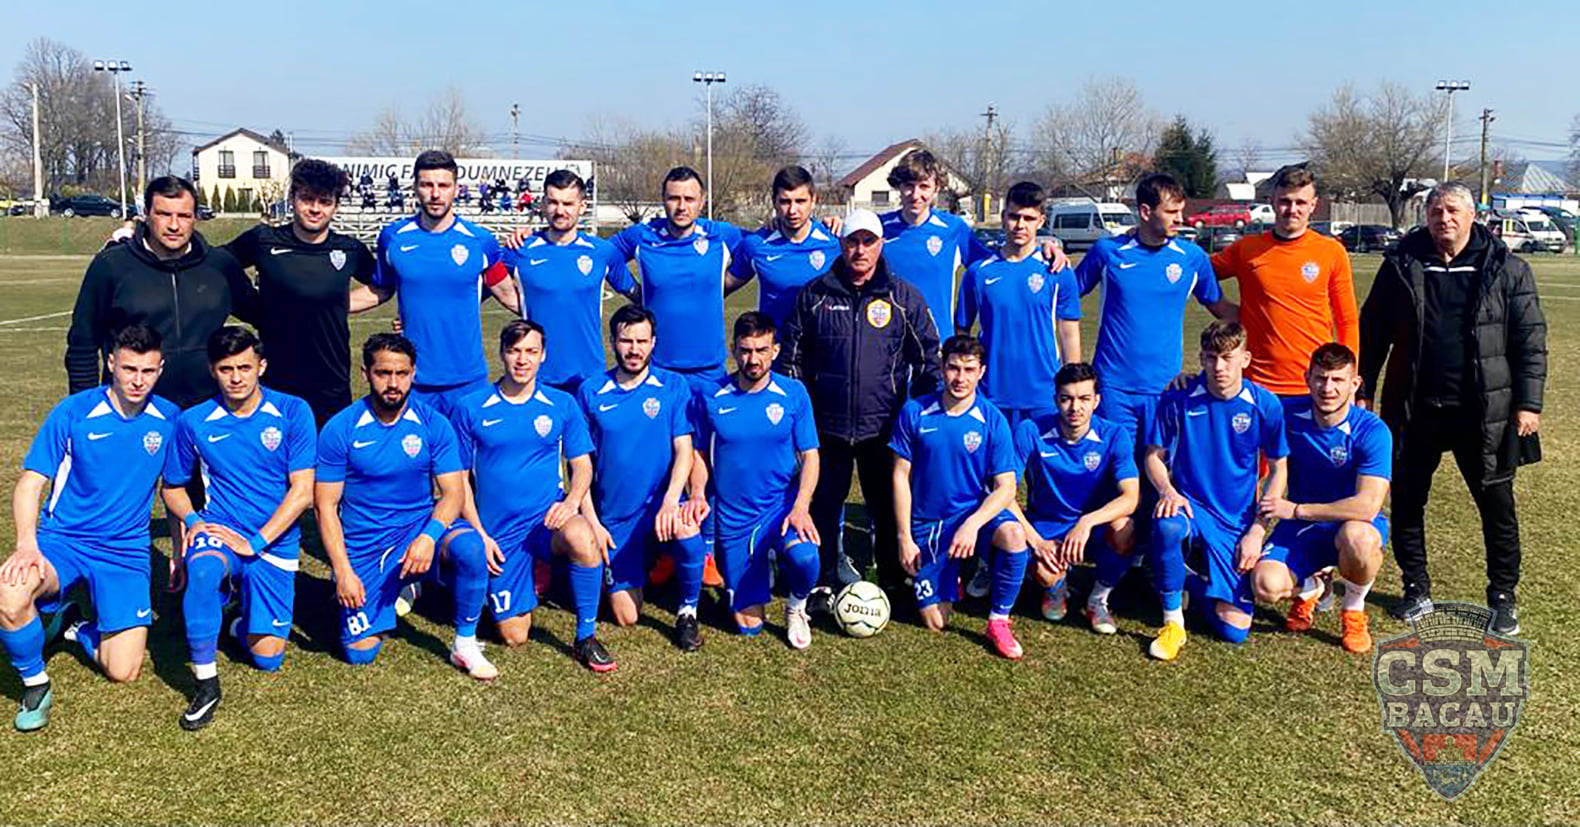 CSM Bacau - Fotbal - Echipa